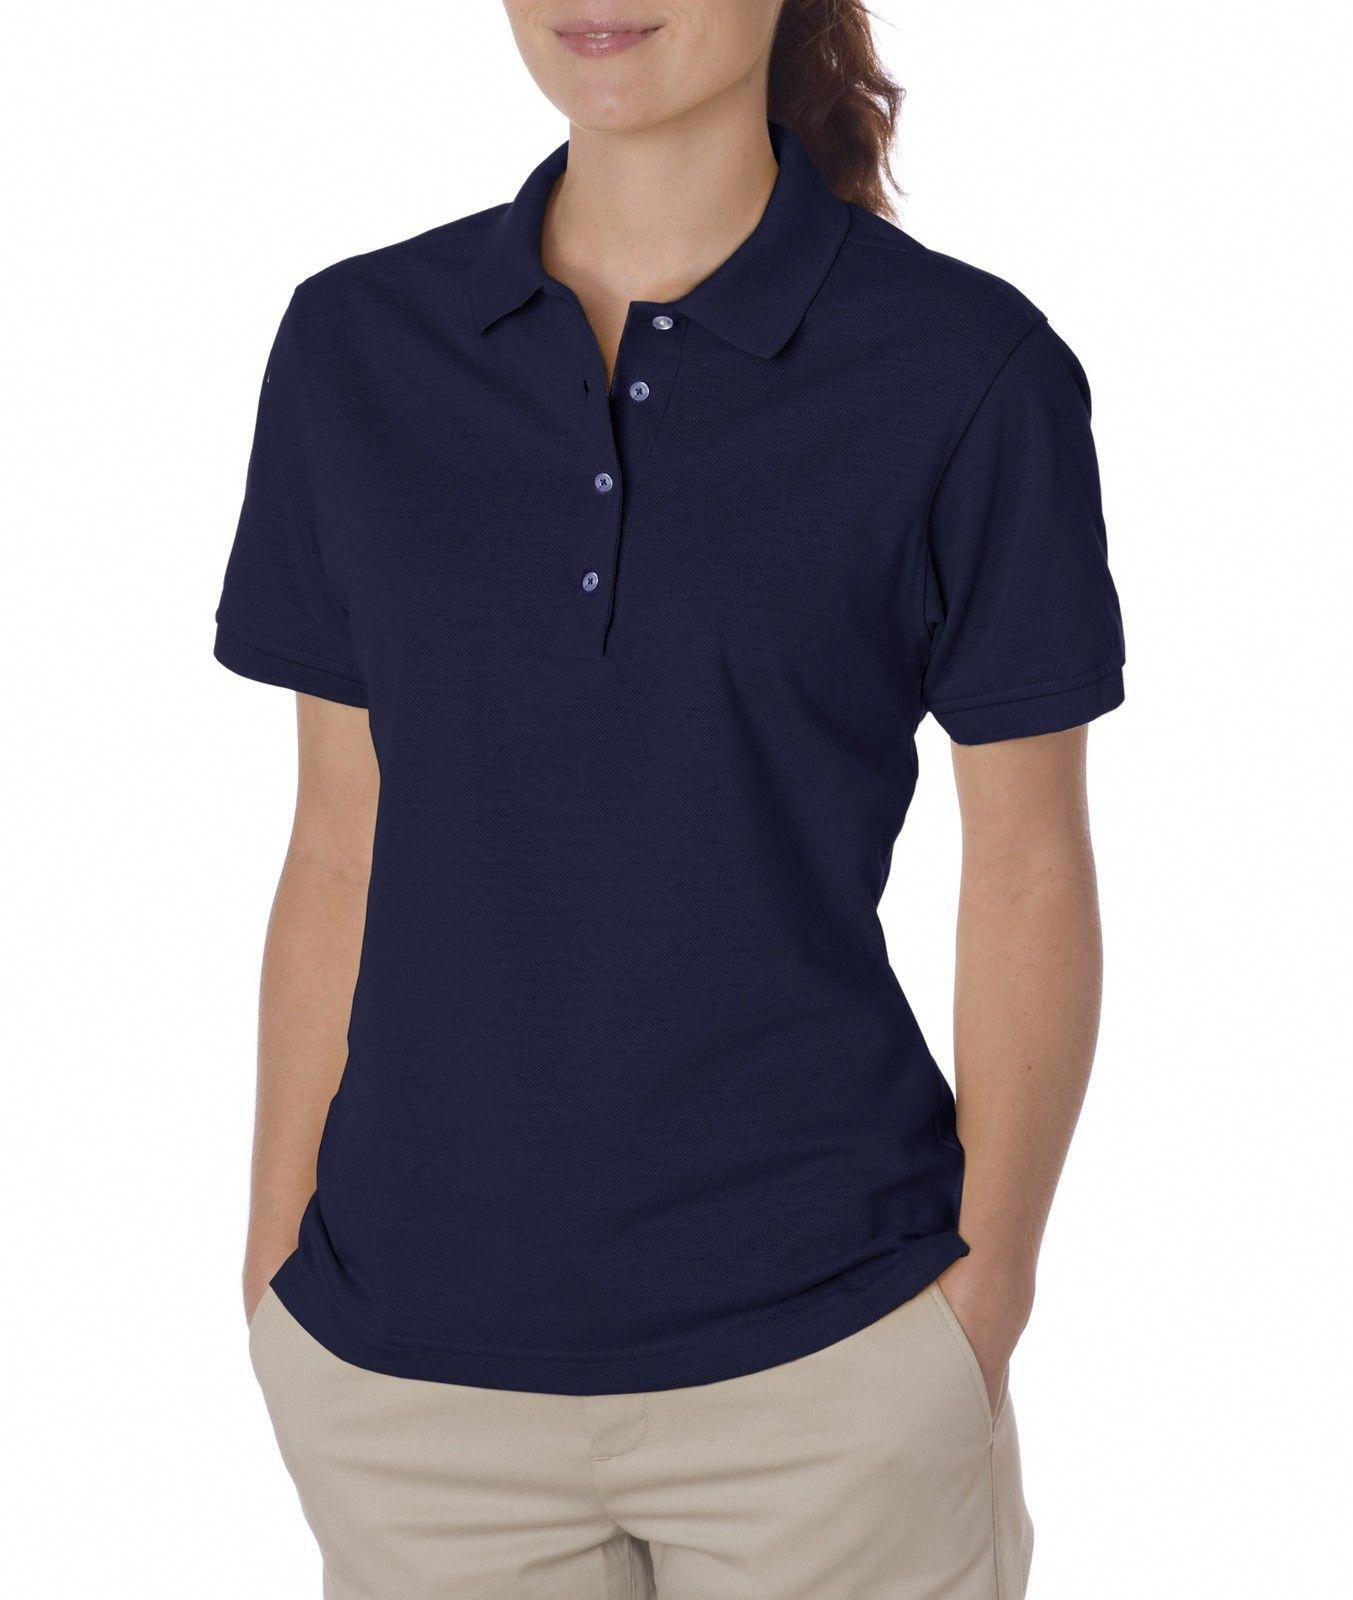 Jerzees Women'S Spotshield Short Sleeve Solid Polo Shirt